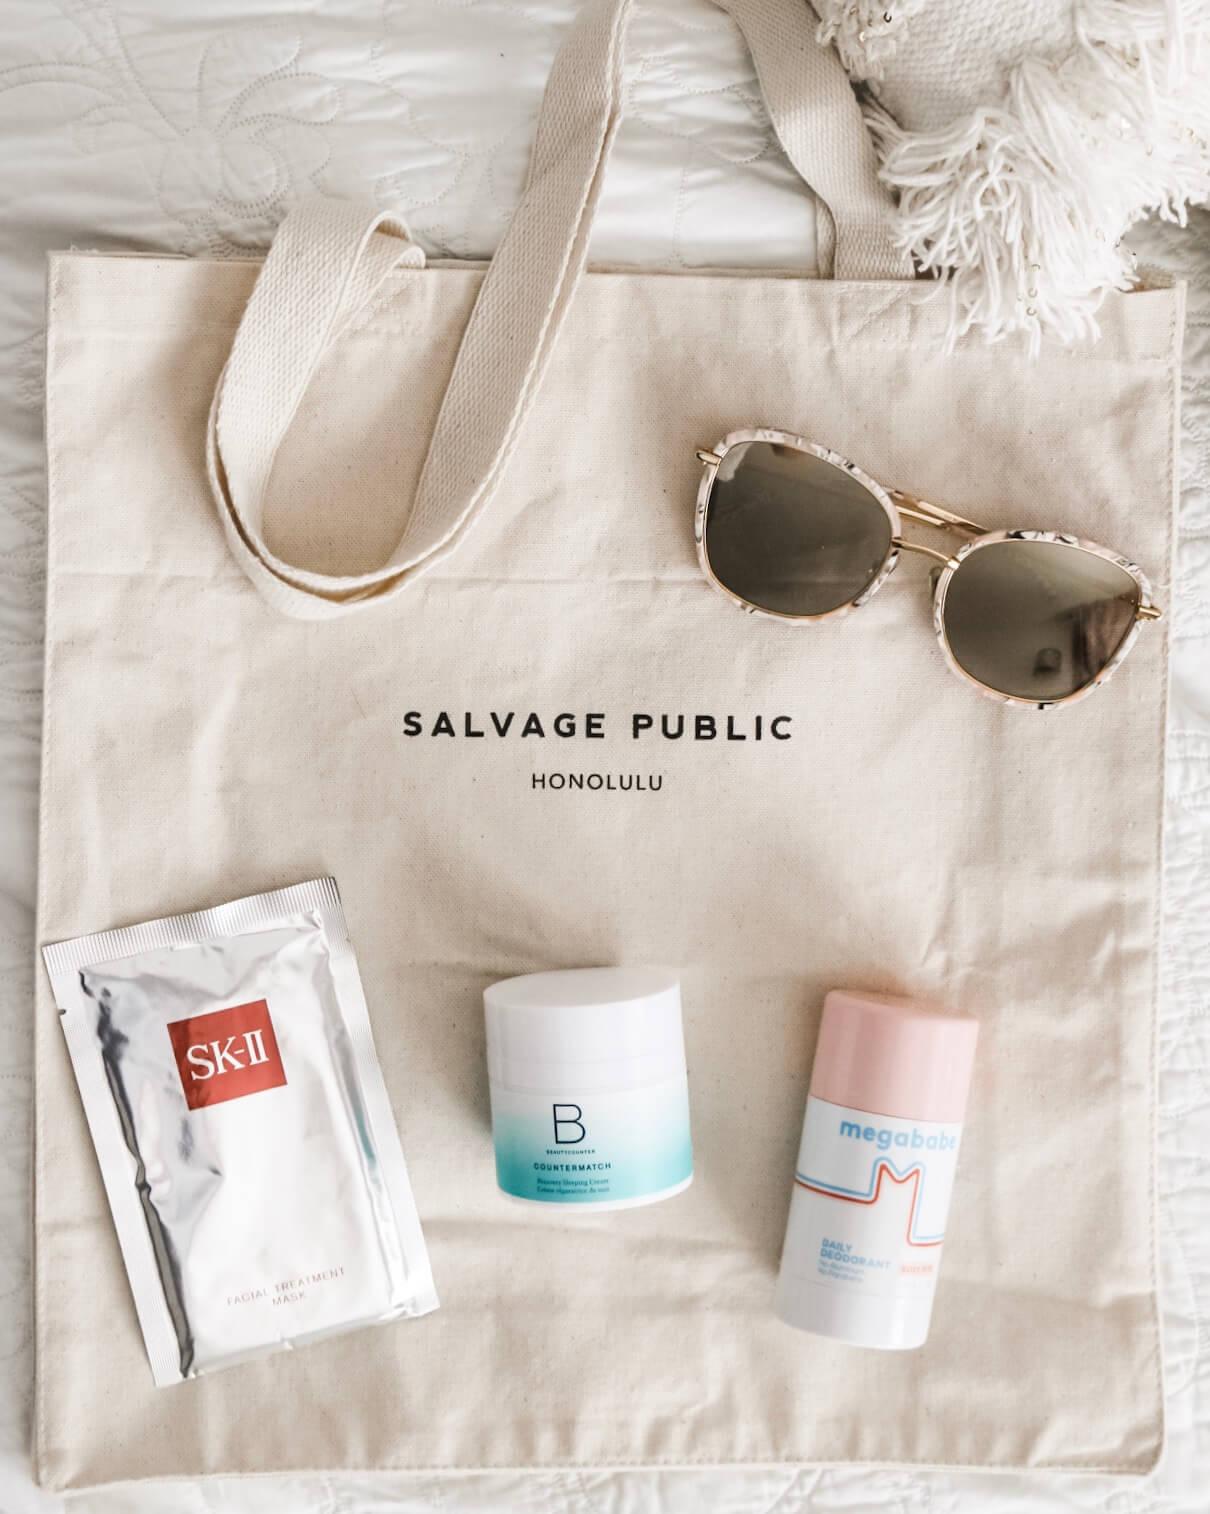 Travel Essentials BeautyCounter-Salvage-GentleMonster-SKIII-megababe.jpg